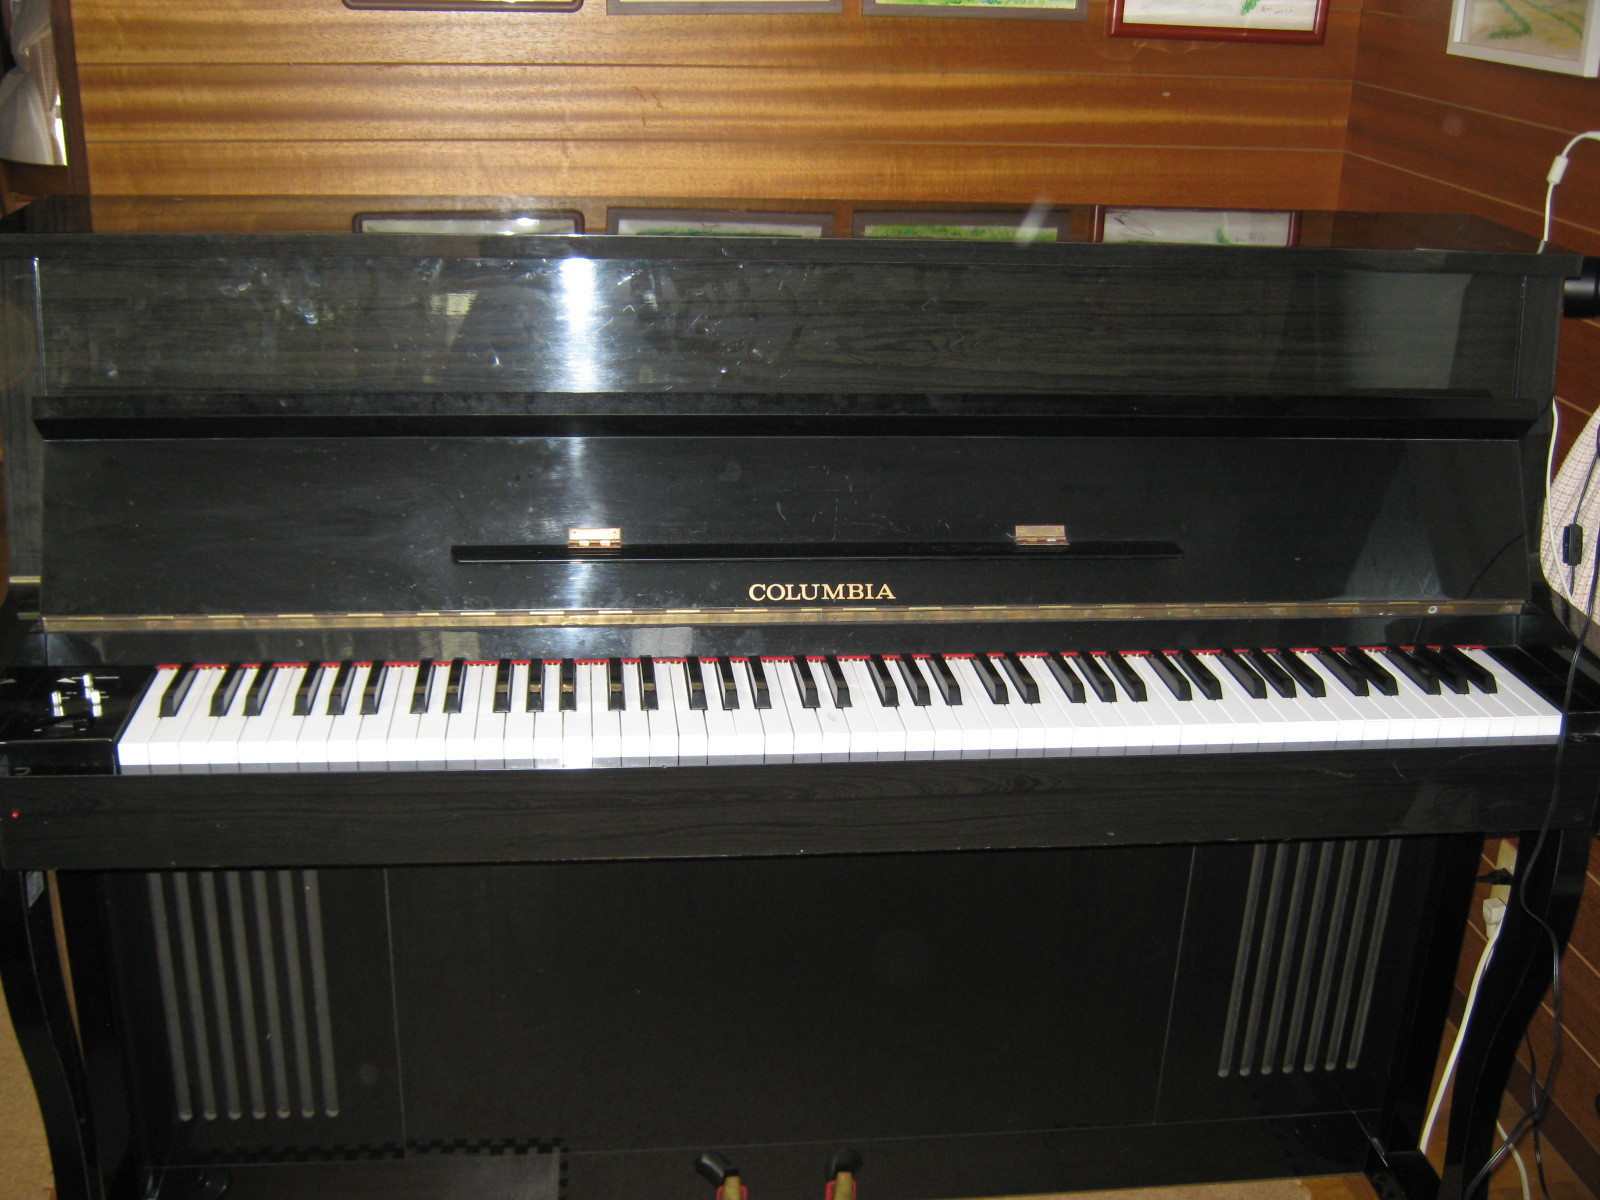 COLUMBIA電気ピアノ(抵抗不良)外観